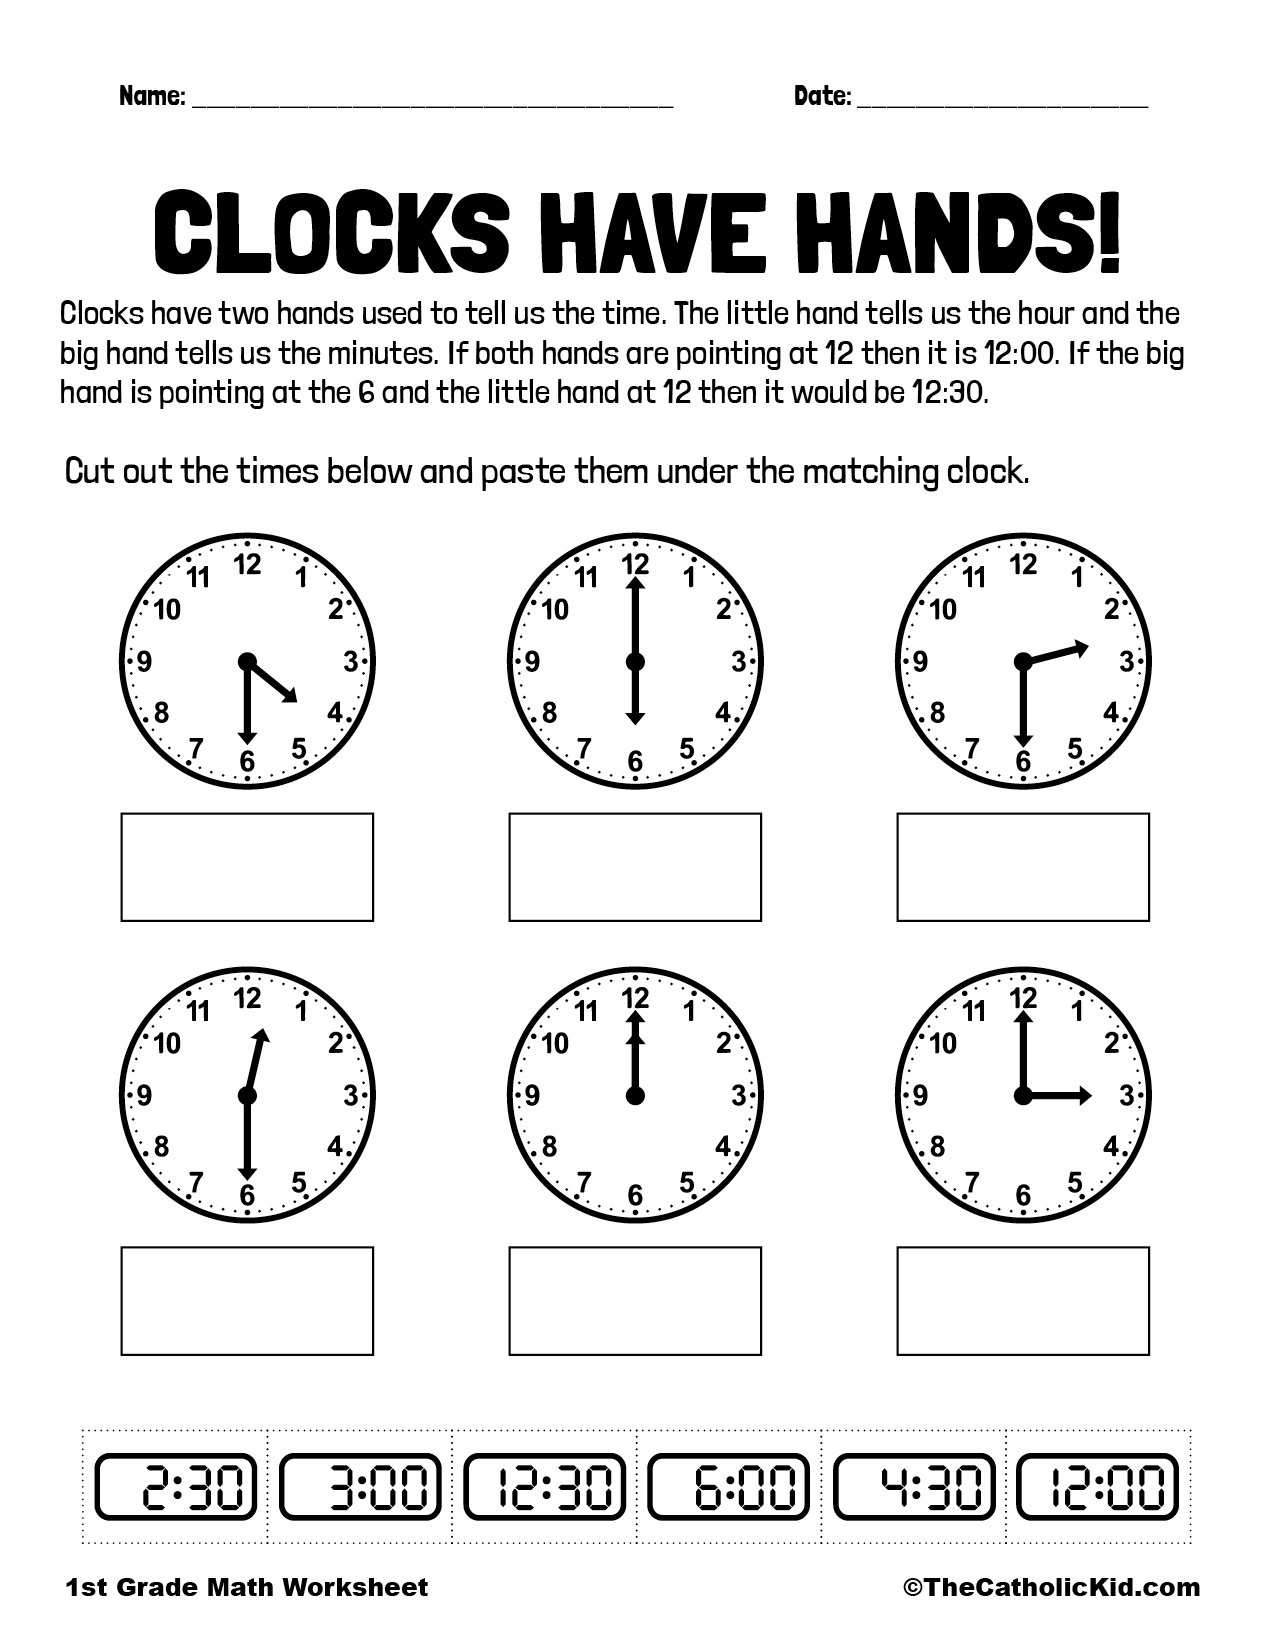 1st Grade Math Catholic Themed Worksheet Clocks